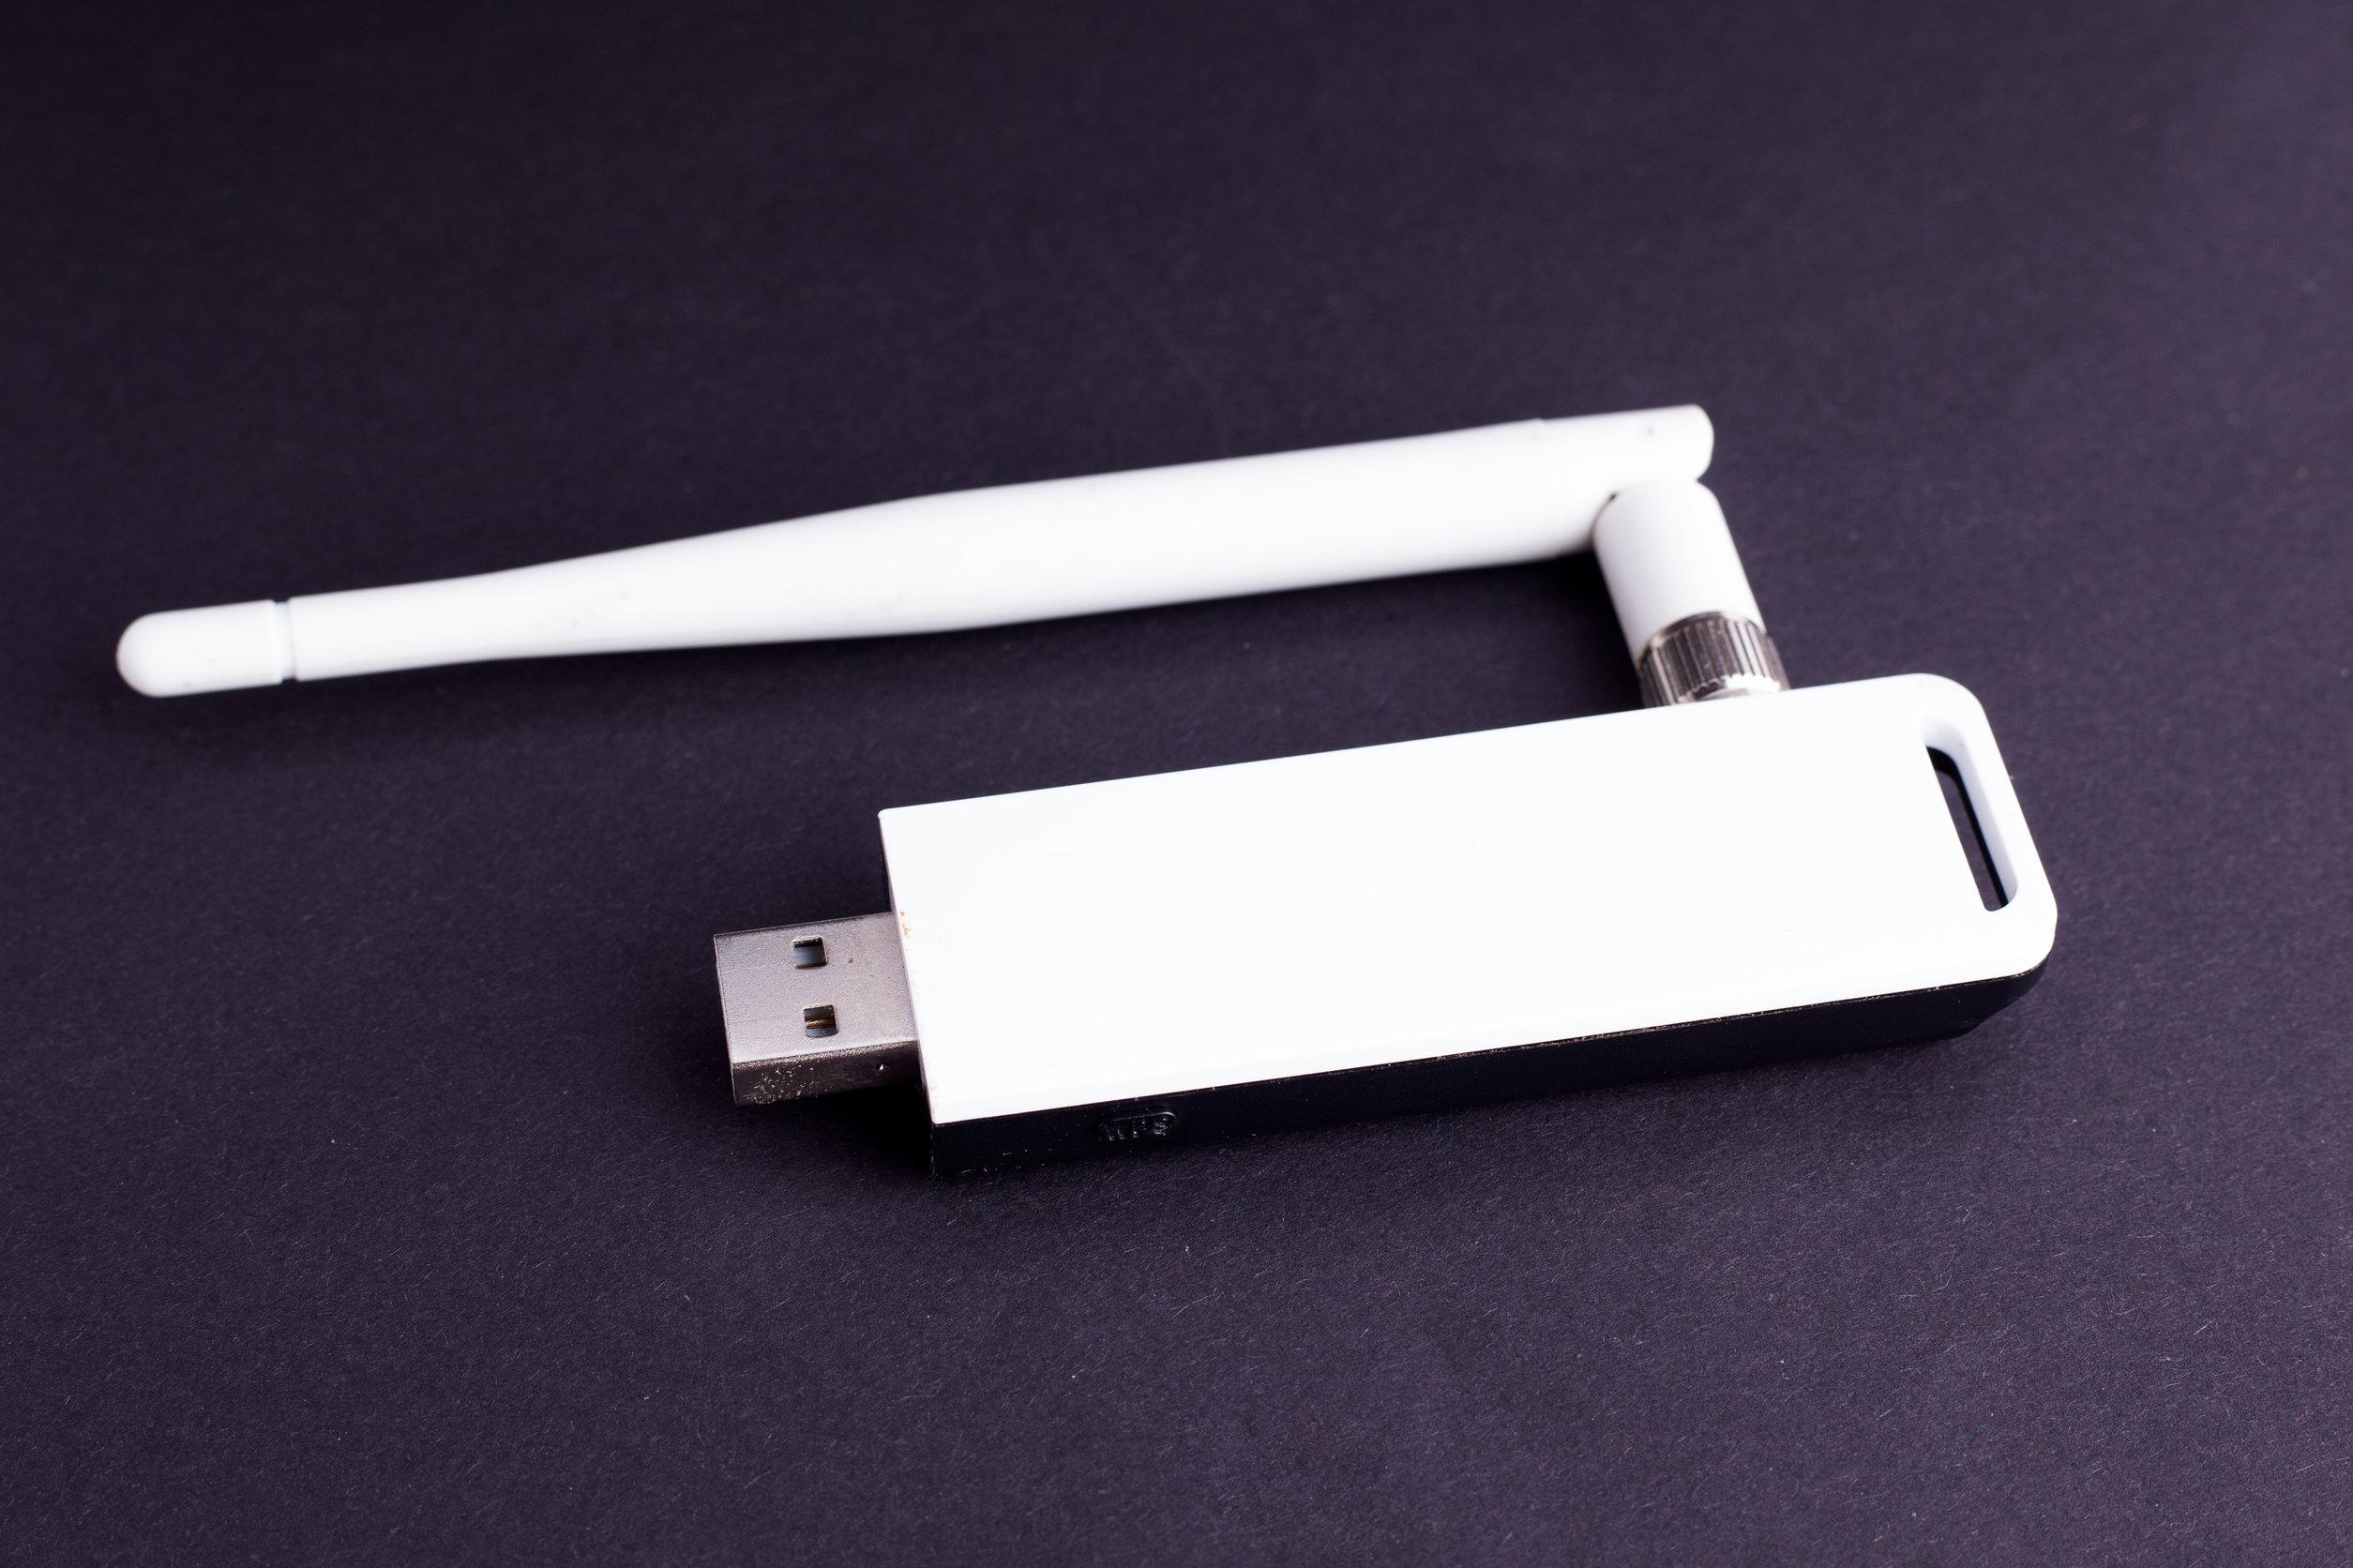 Antena wifi blanca